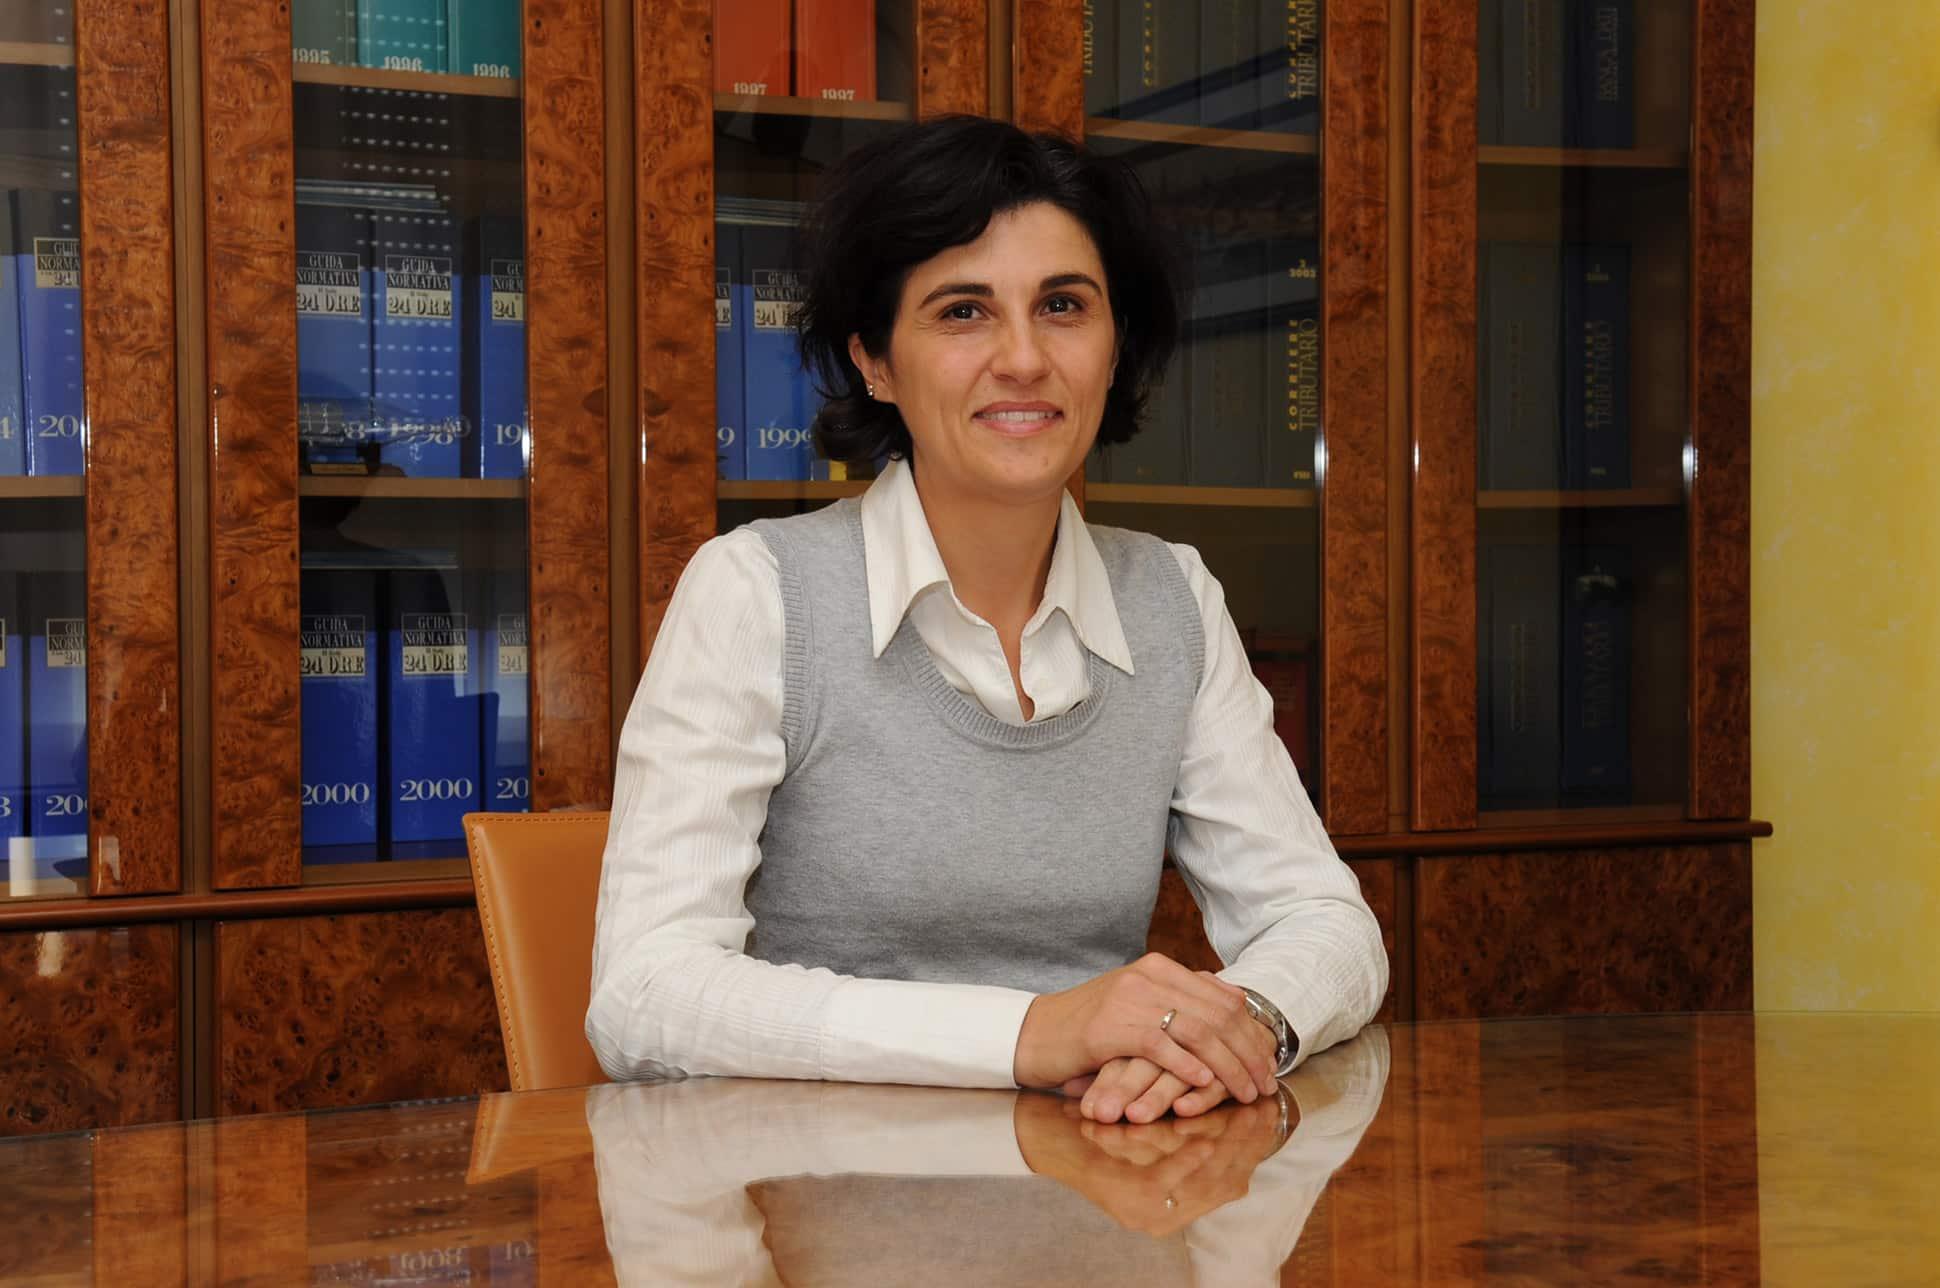 Paola Bariati